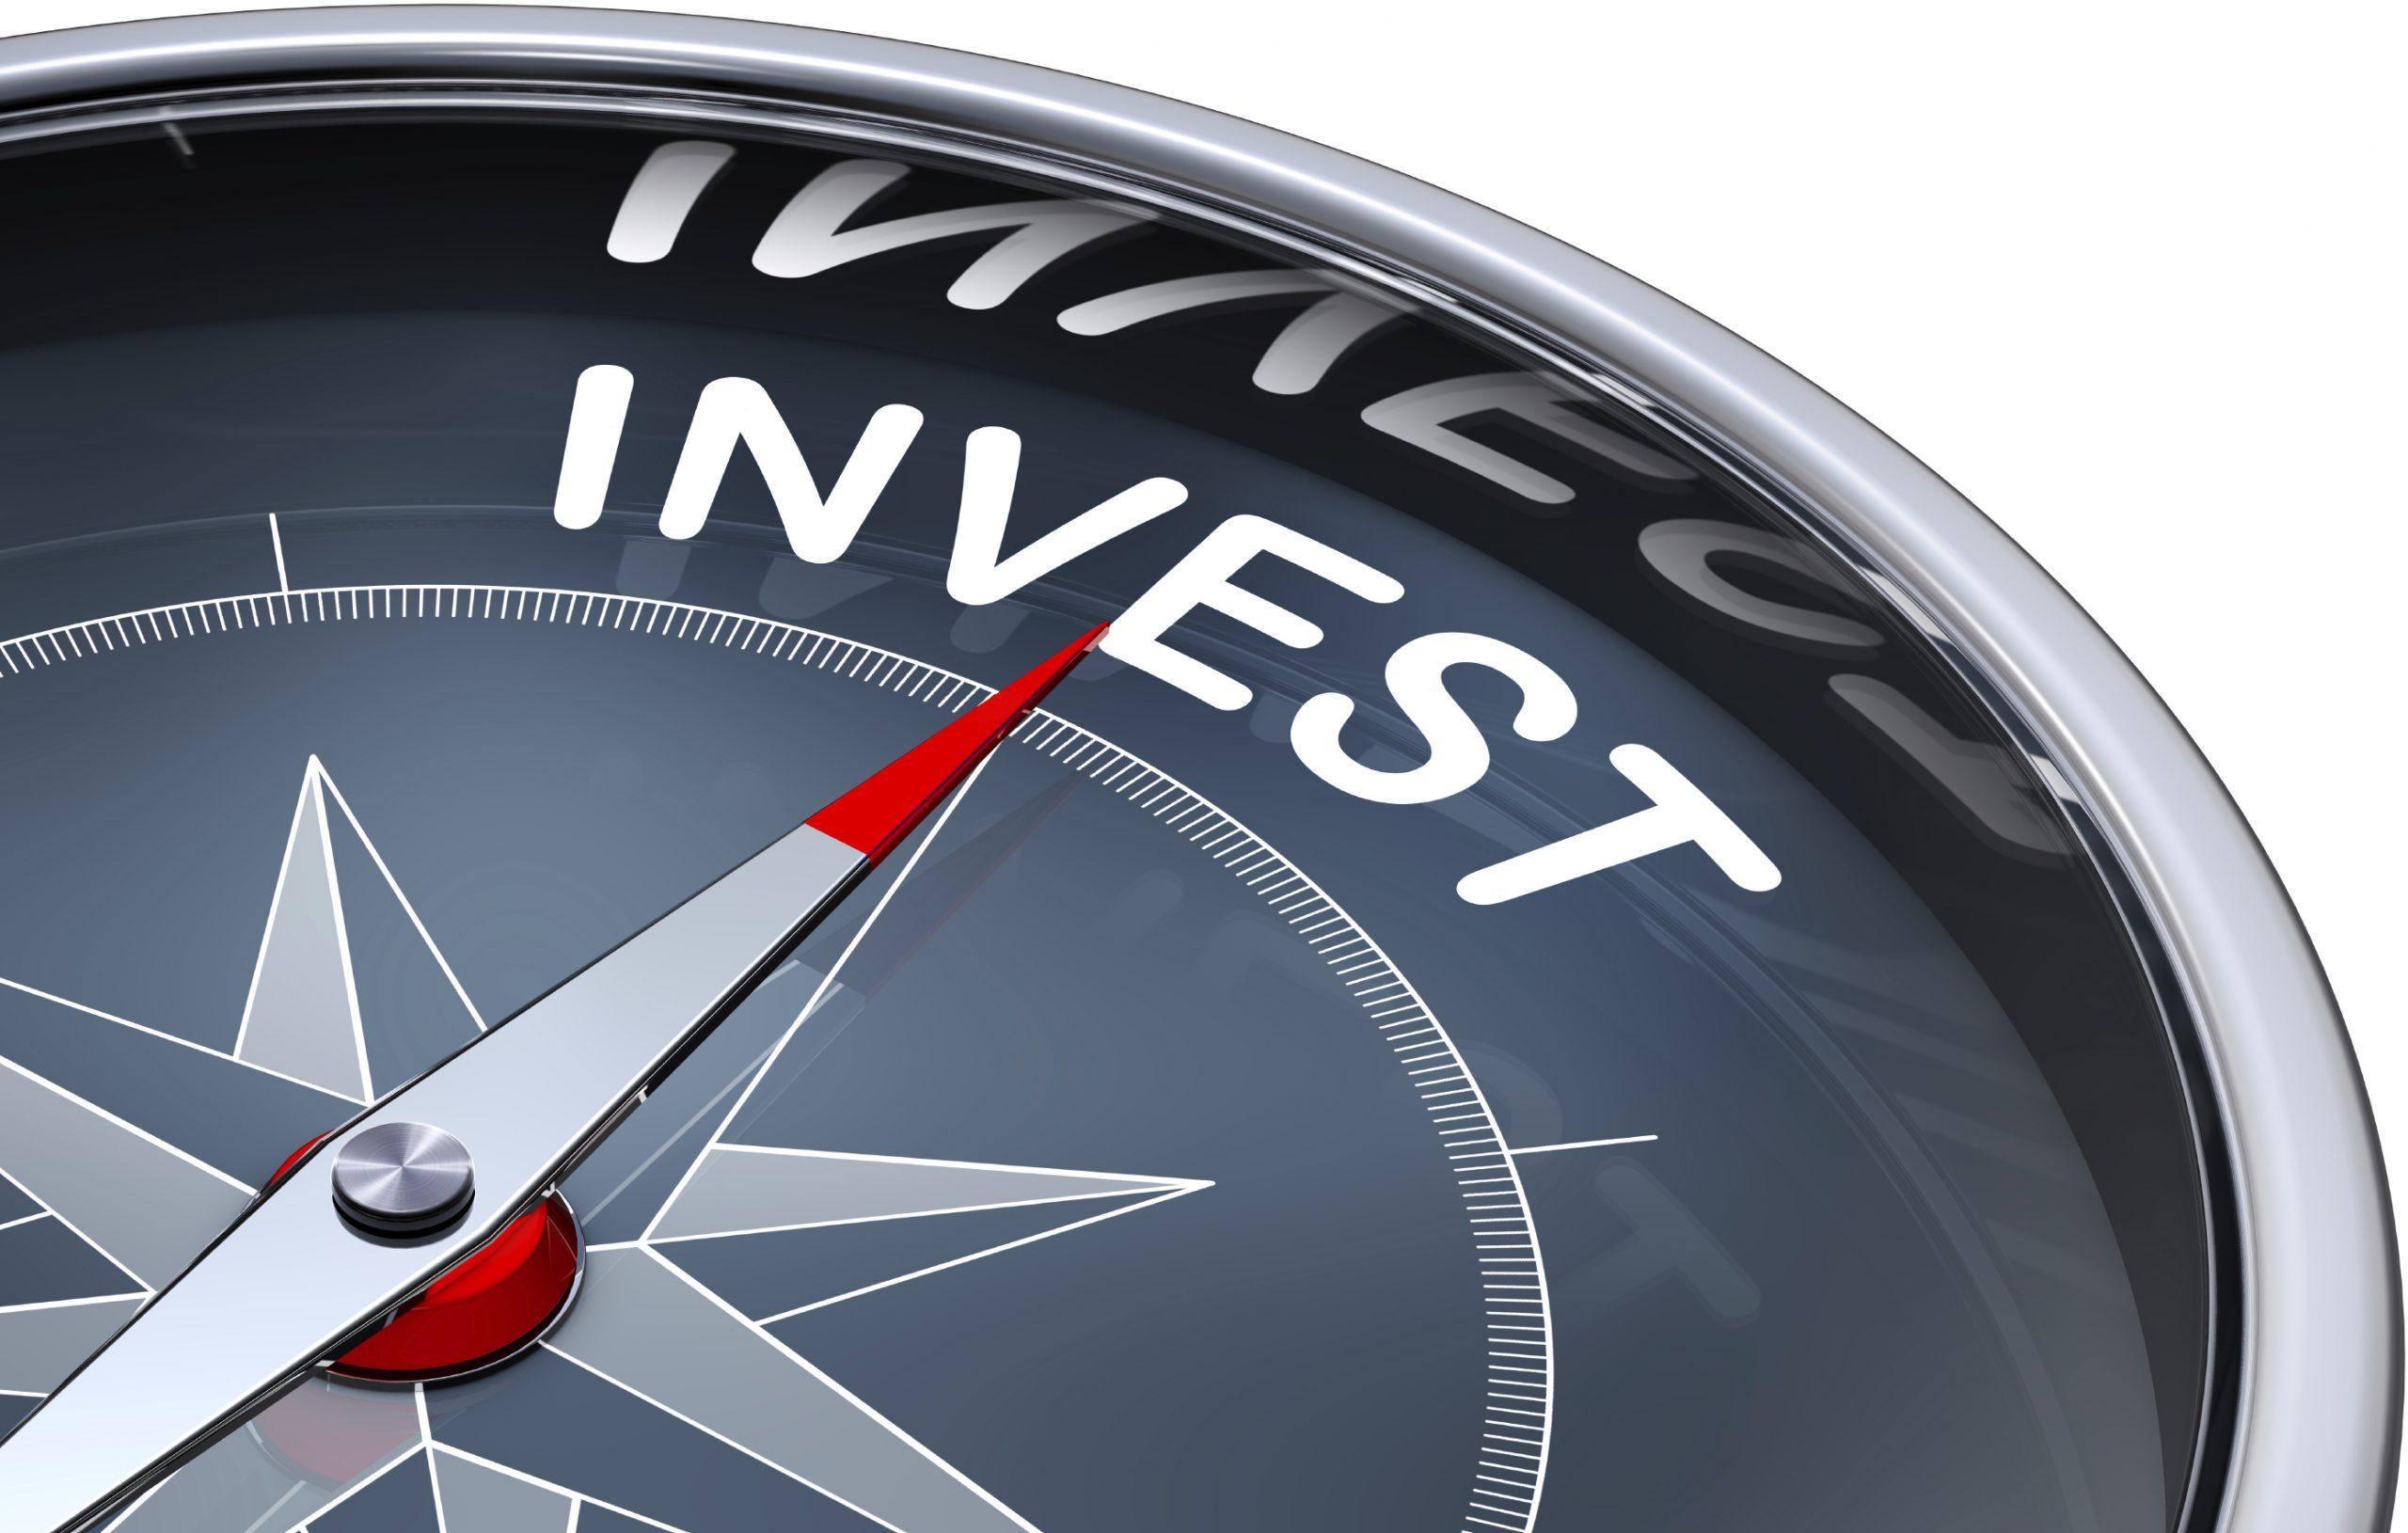 15 Best Investment Companies in Nigeria